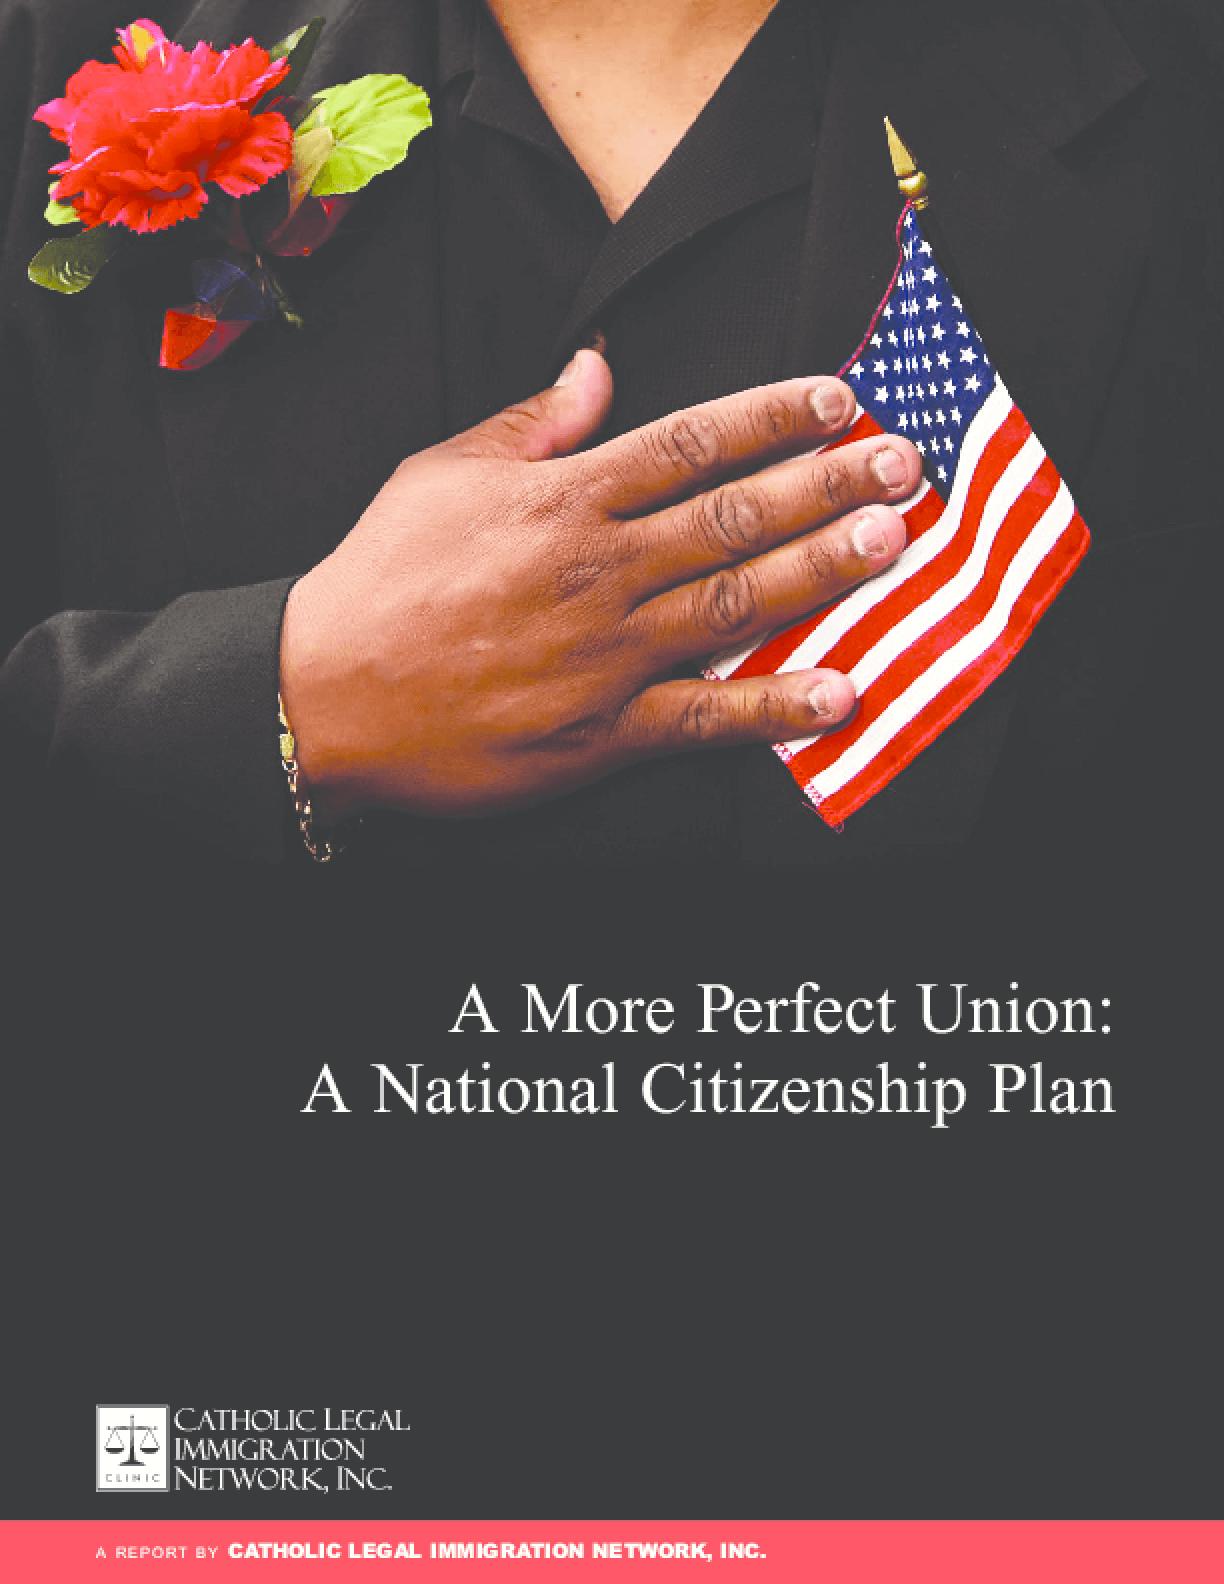 A More Perfect Union: A National Citizenship Plan